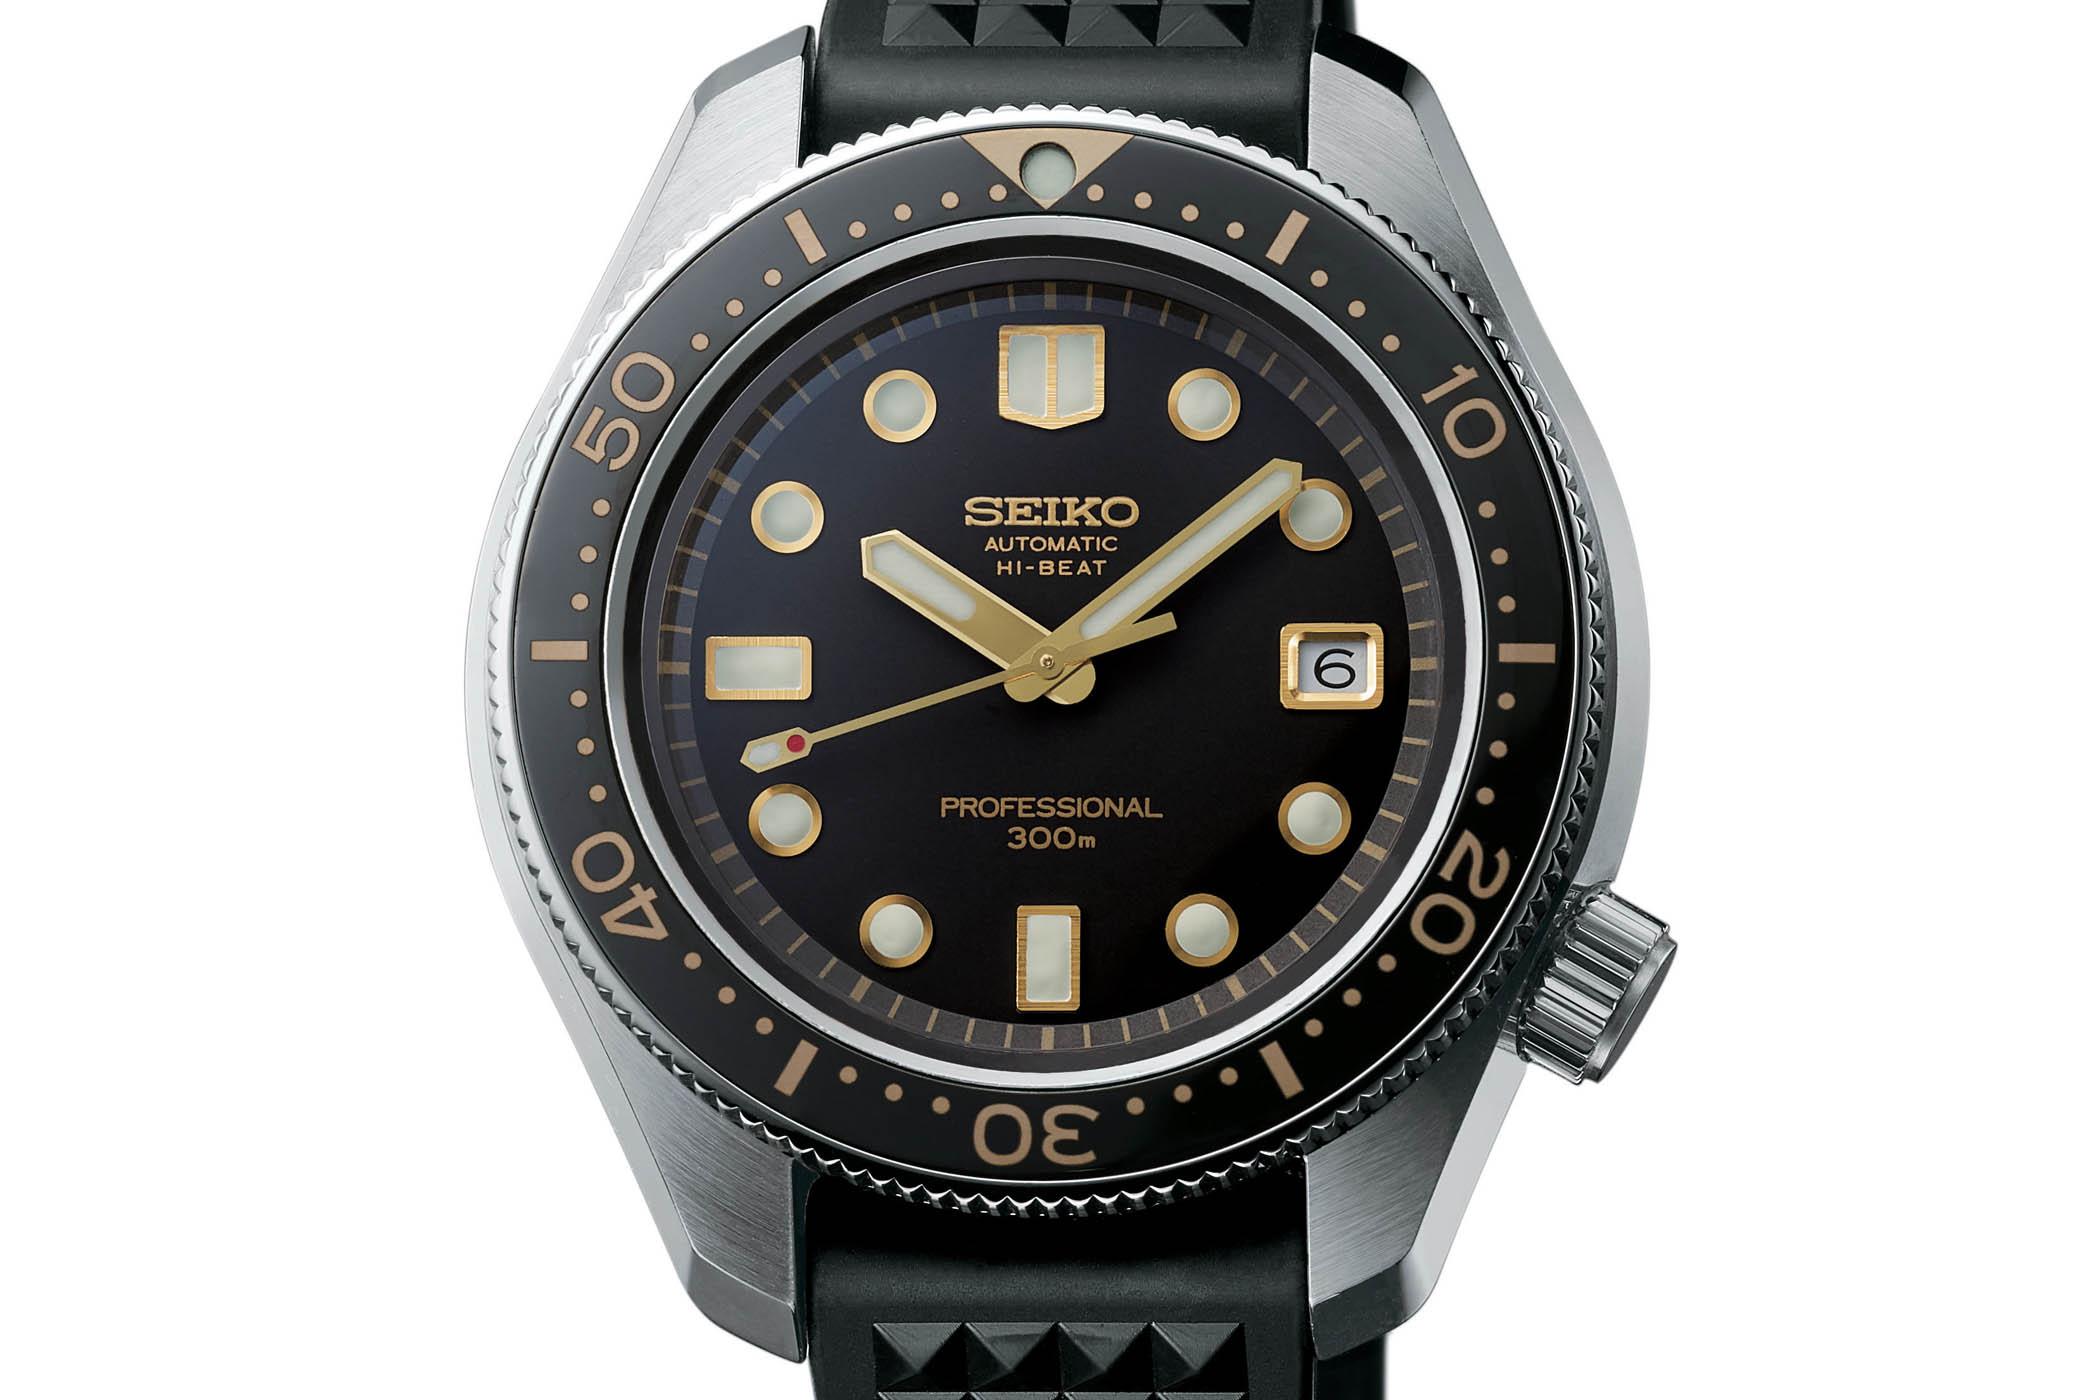 Seiko Prospex Diver 300m Hi-Beat SLA025 - Baselworld 2018